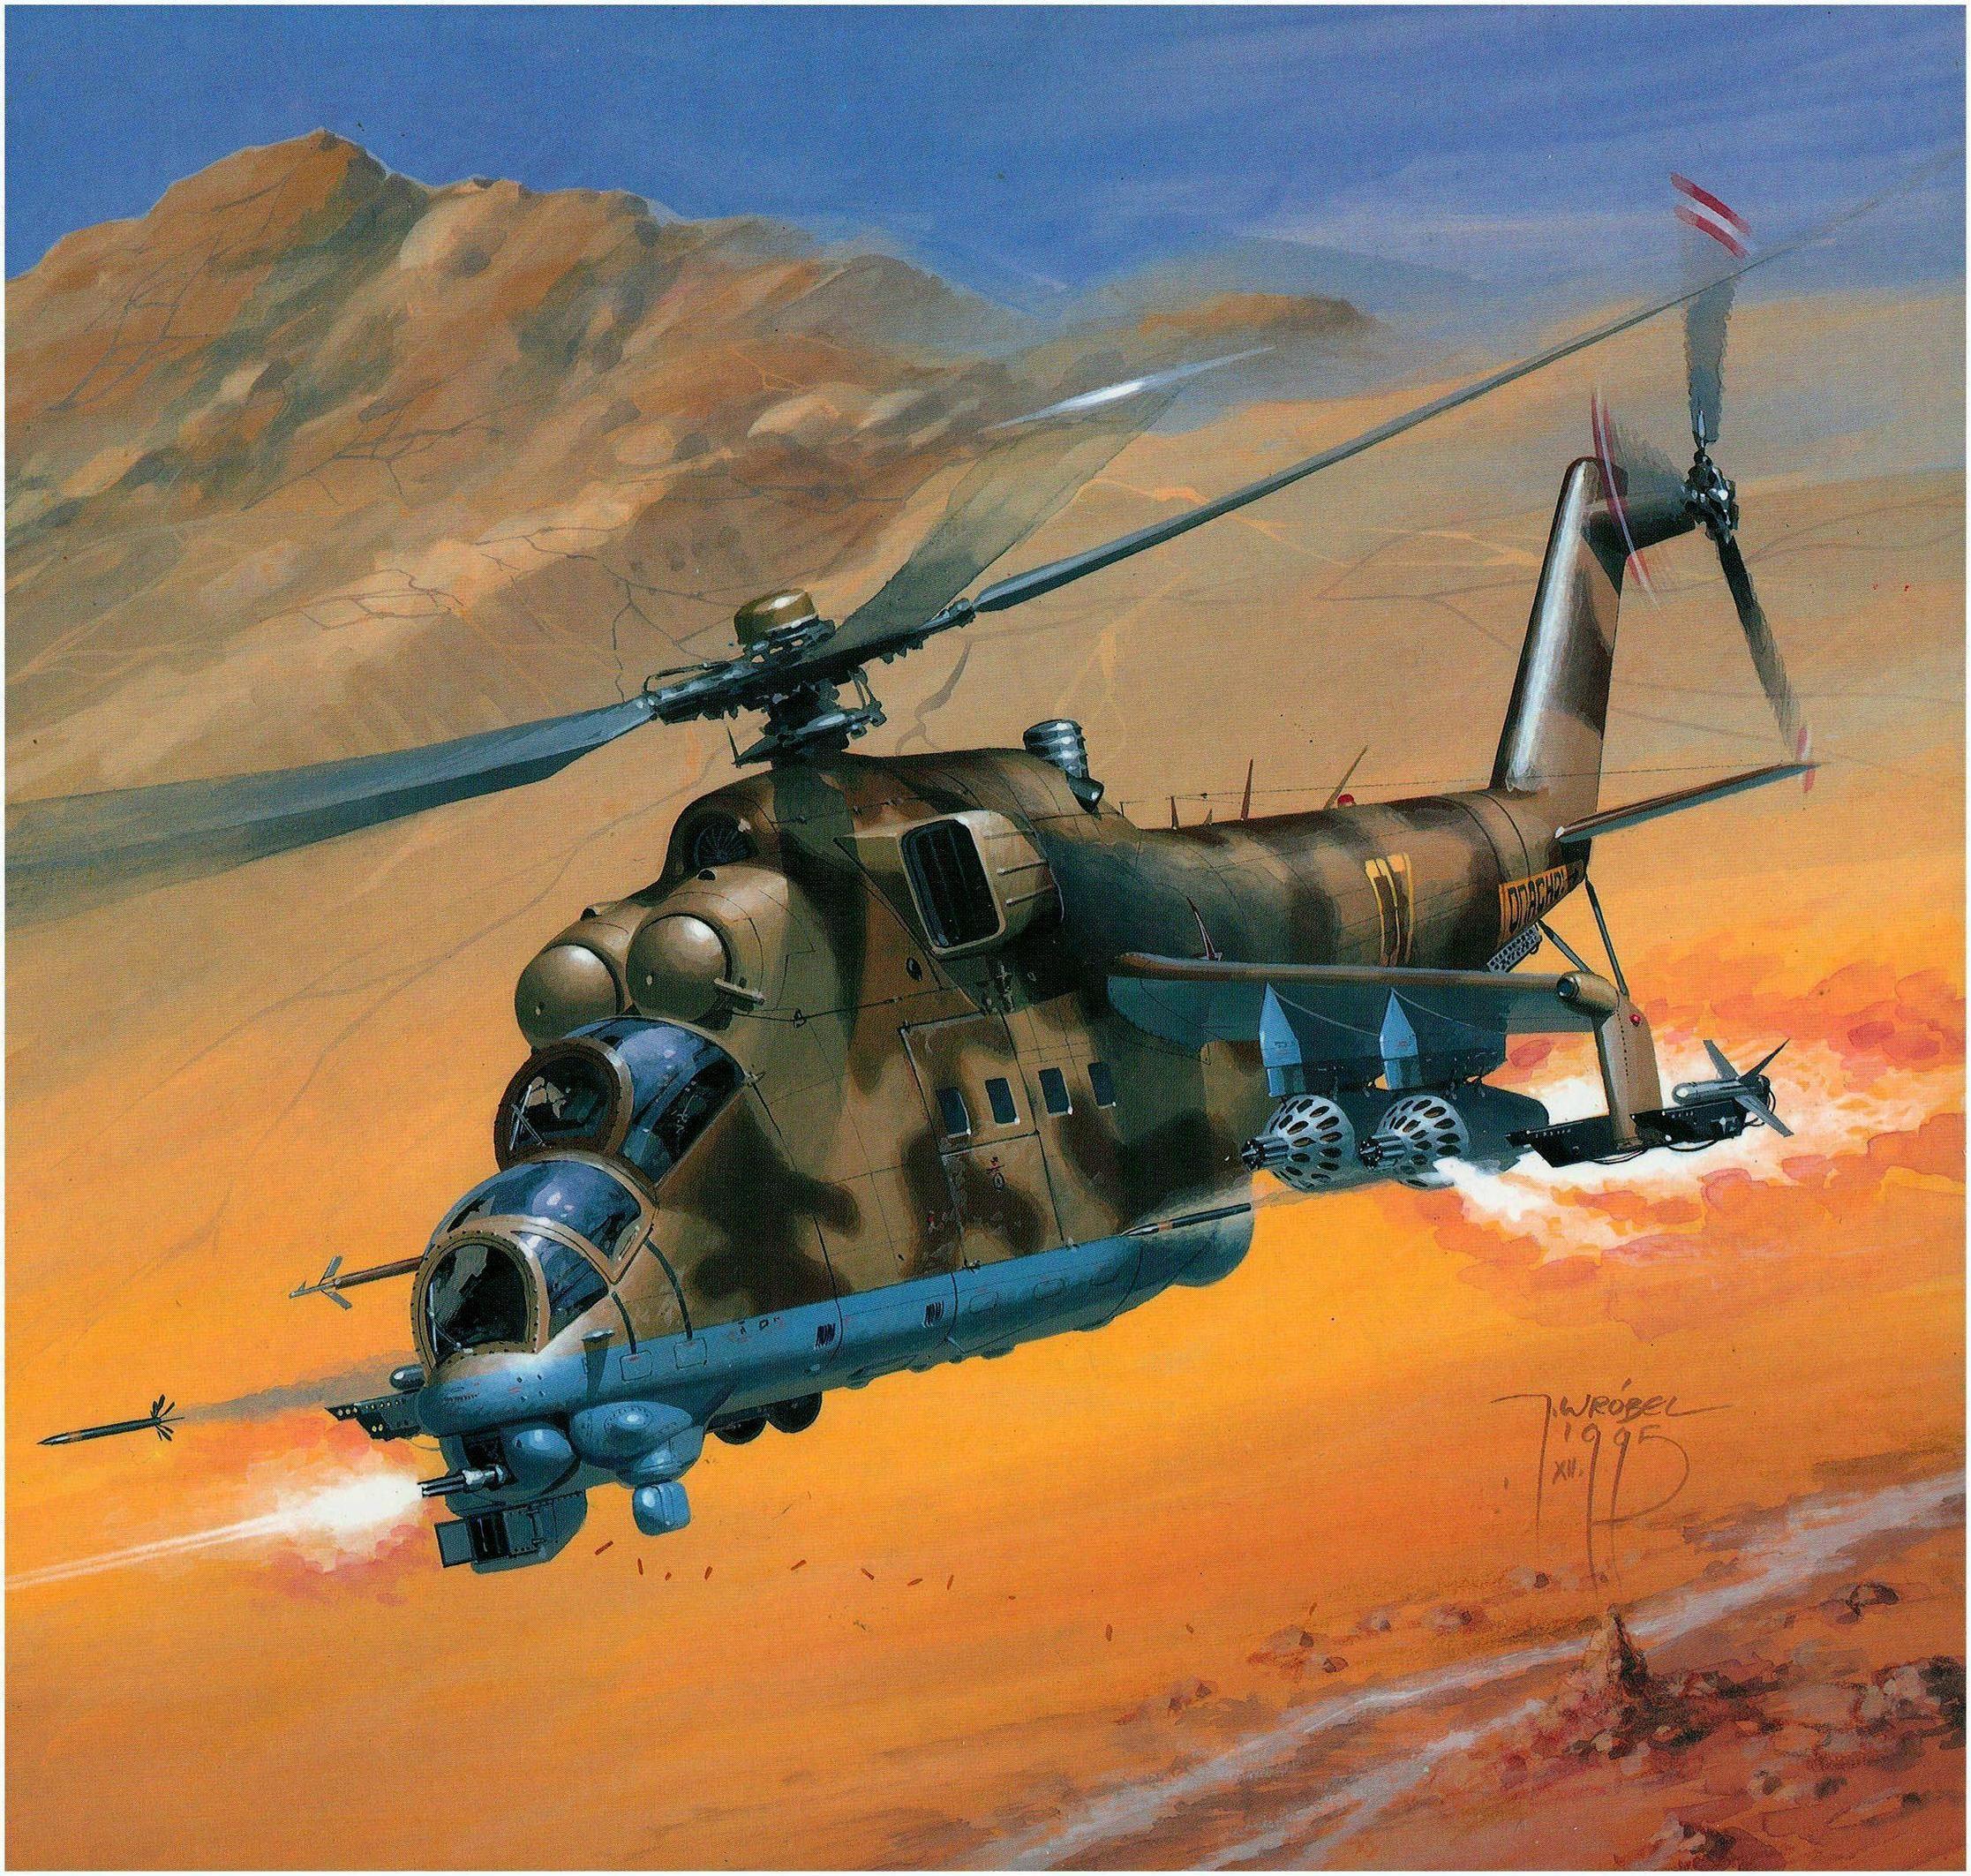 Mil Mi-24D Hind. | Soviet-Afghan War Art | Pinterest ...